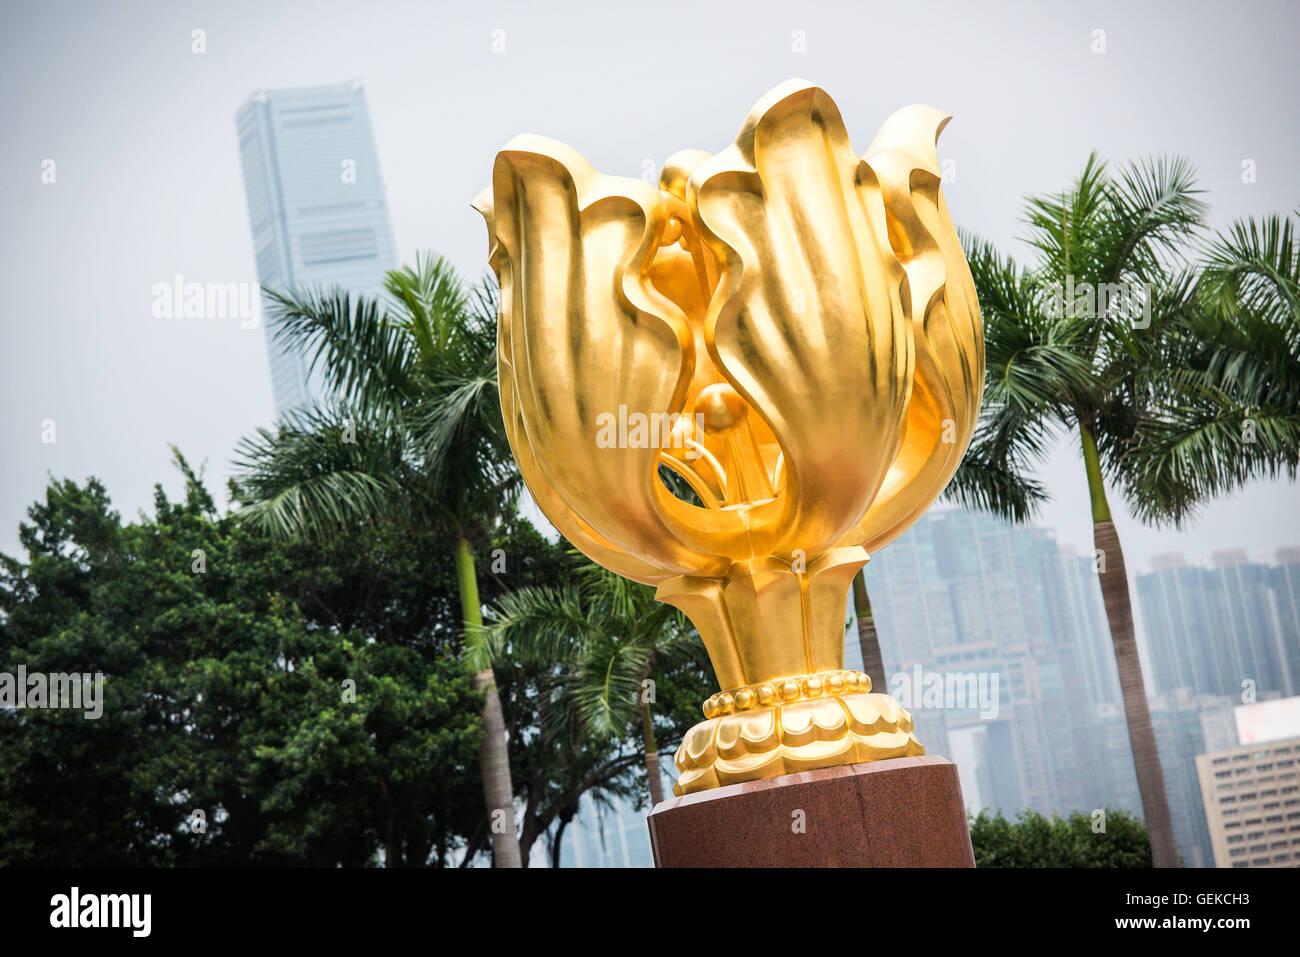 December 15, 2015 - Hong Kong, Hong Kong S.A.R, China - The Forever Blooming Bauhinia Sculpture on Expo Promenade - Stock Image